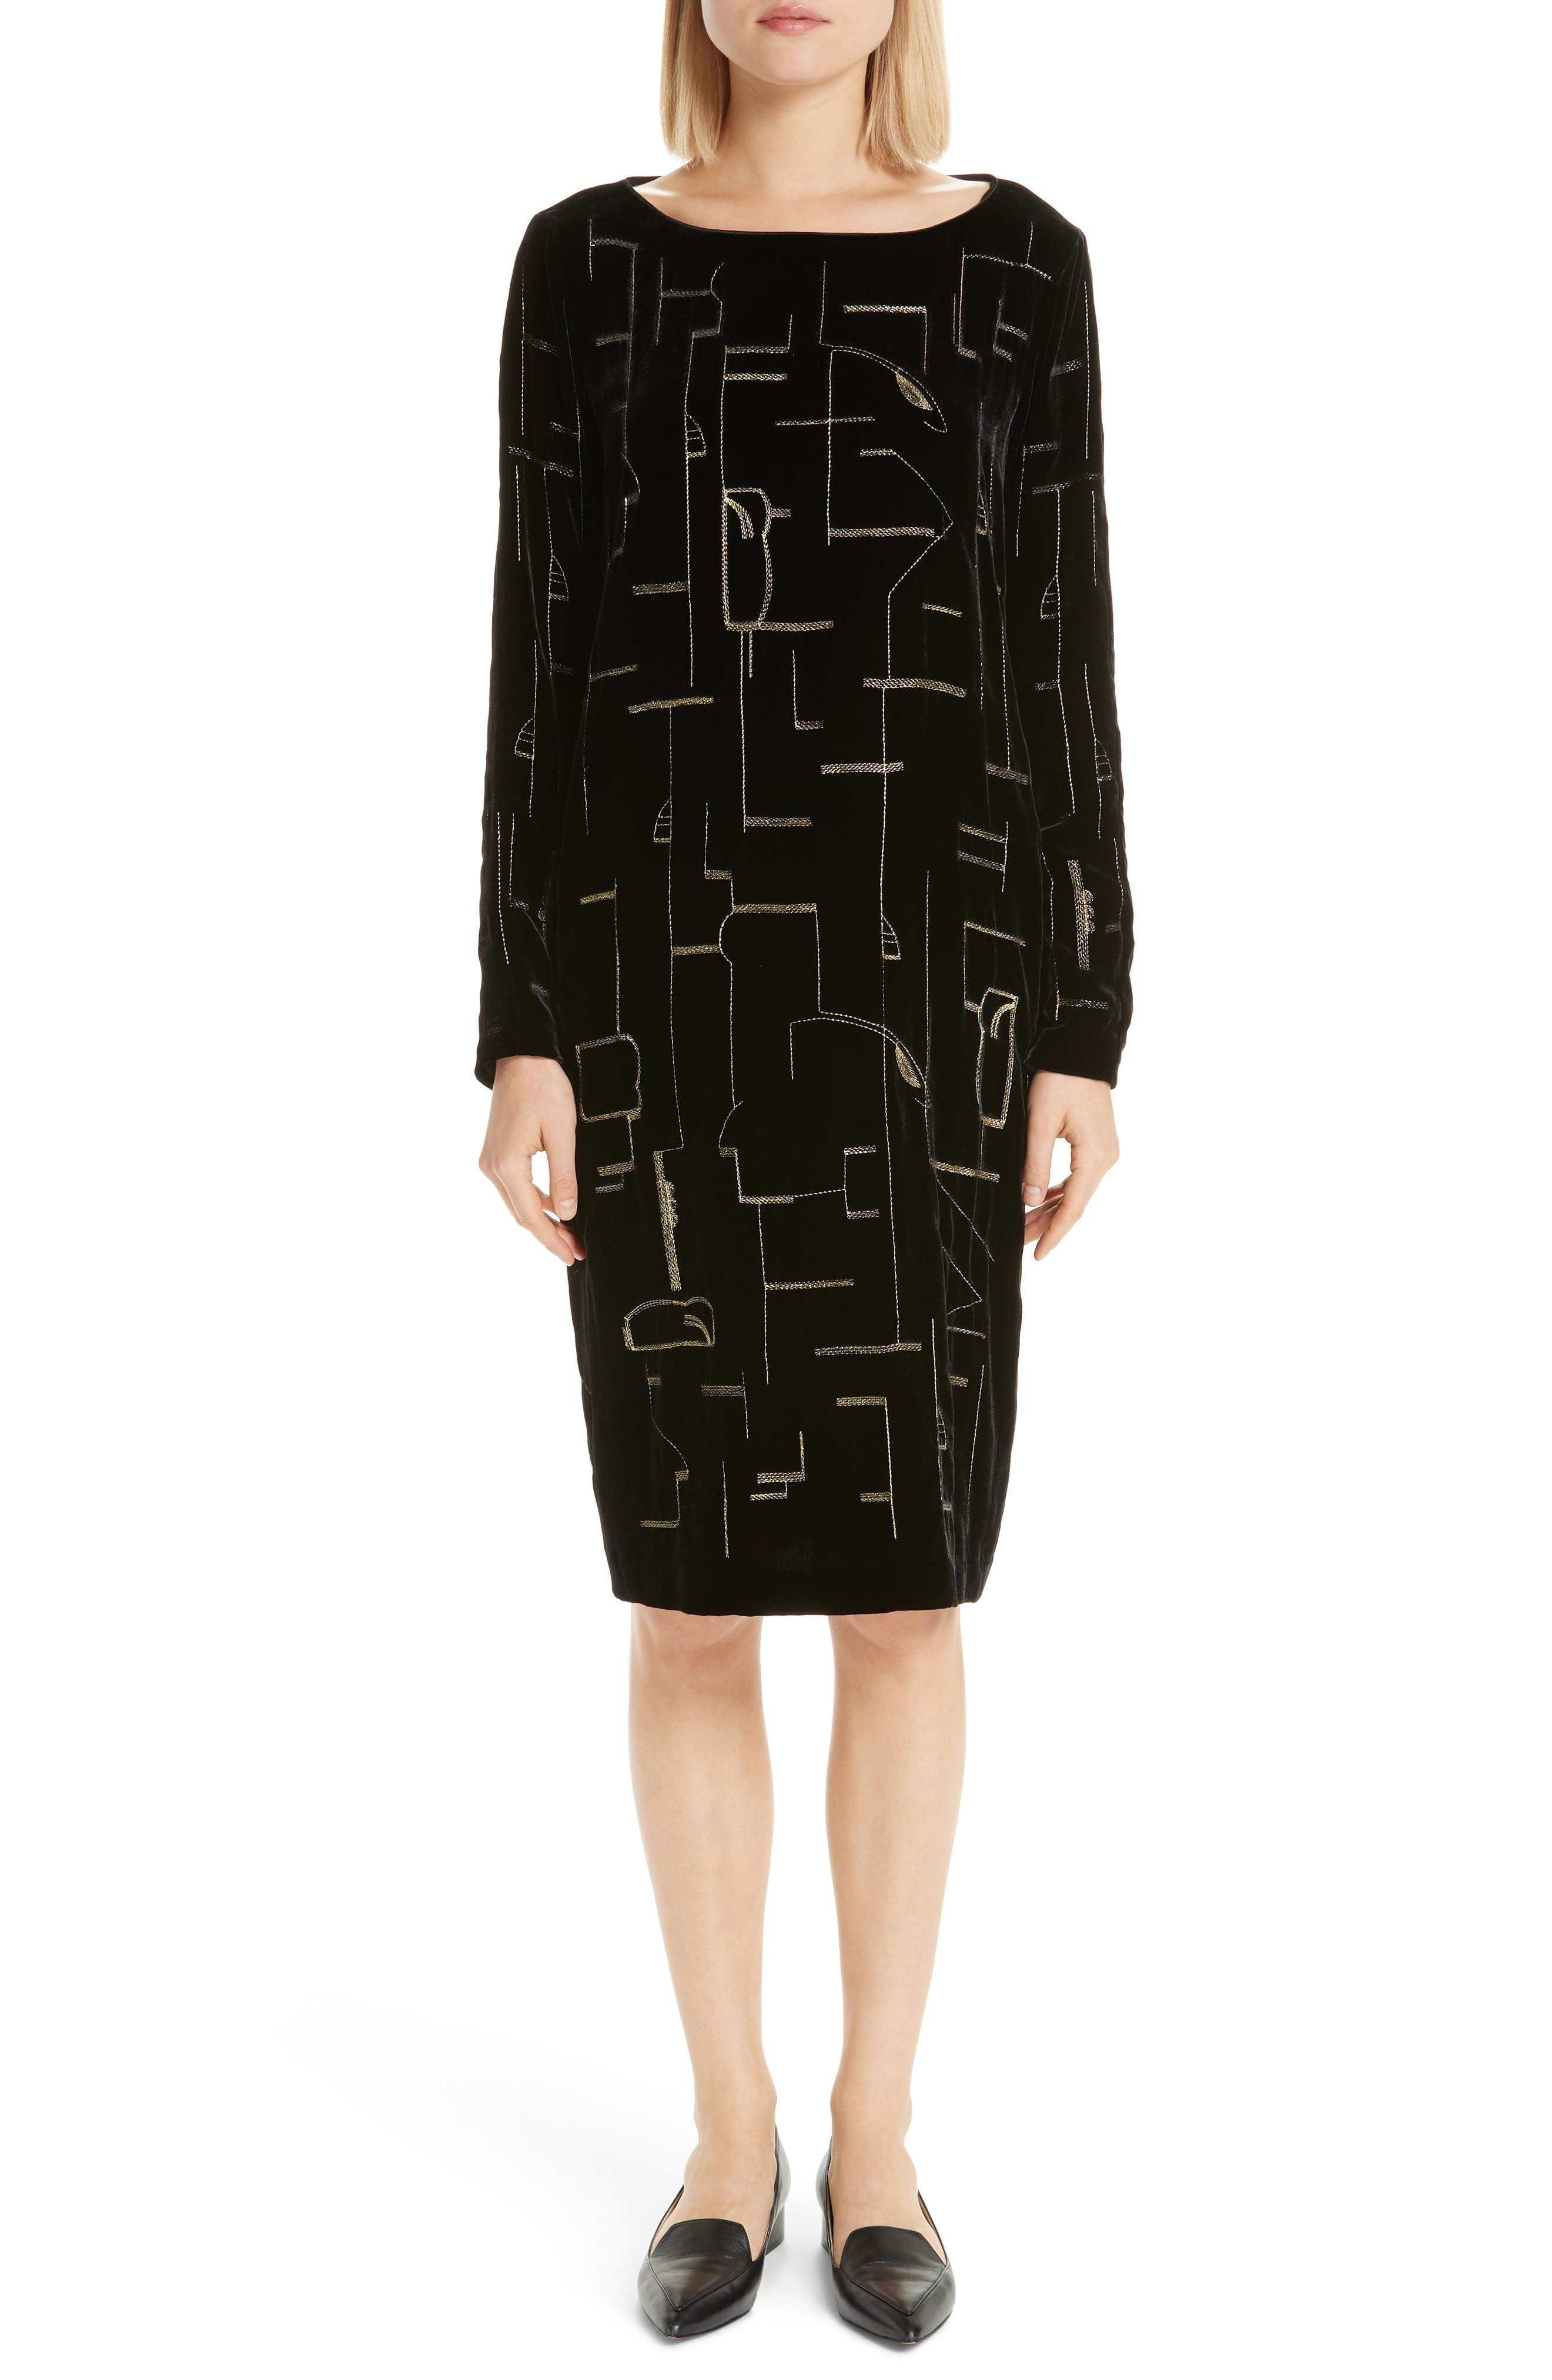 LAFAYETTE 148 NEW YORK,                             Cressida Embellished Velvet Dress,                             Main thumbnail 1, color,                             BLACK MULTI